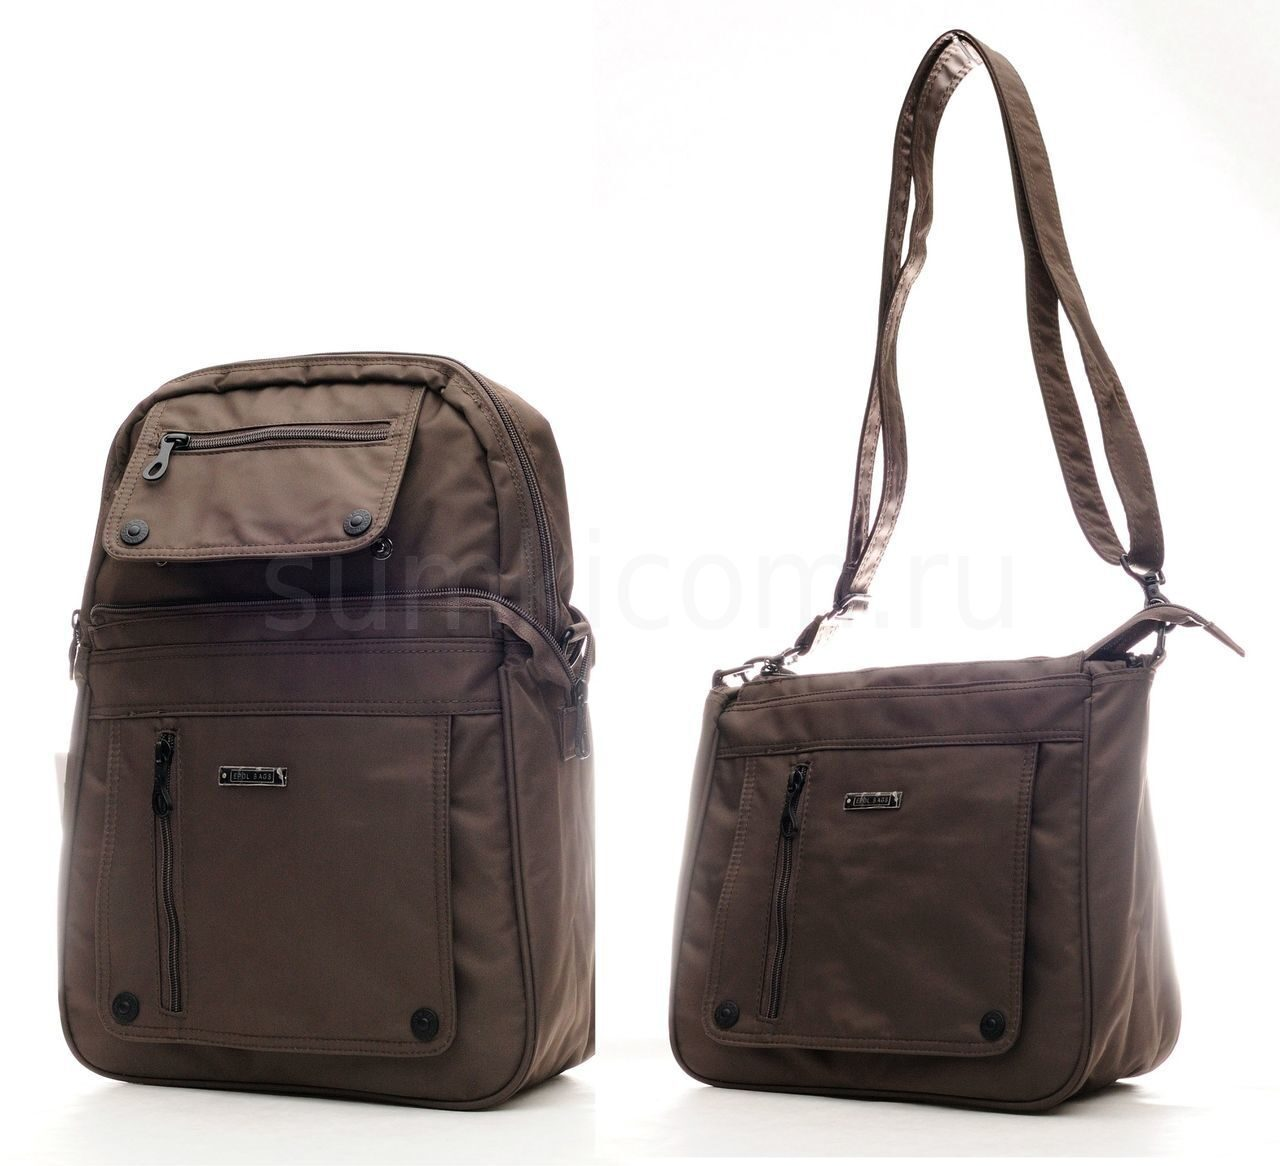 Сумка-рюкзак трансформер мужская дорожная рюкзак вшысщмукн вкшаеук 40